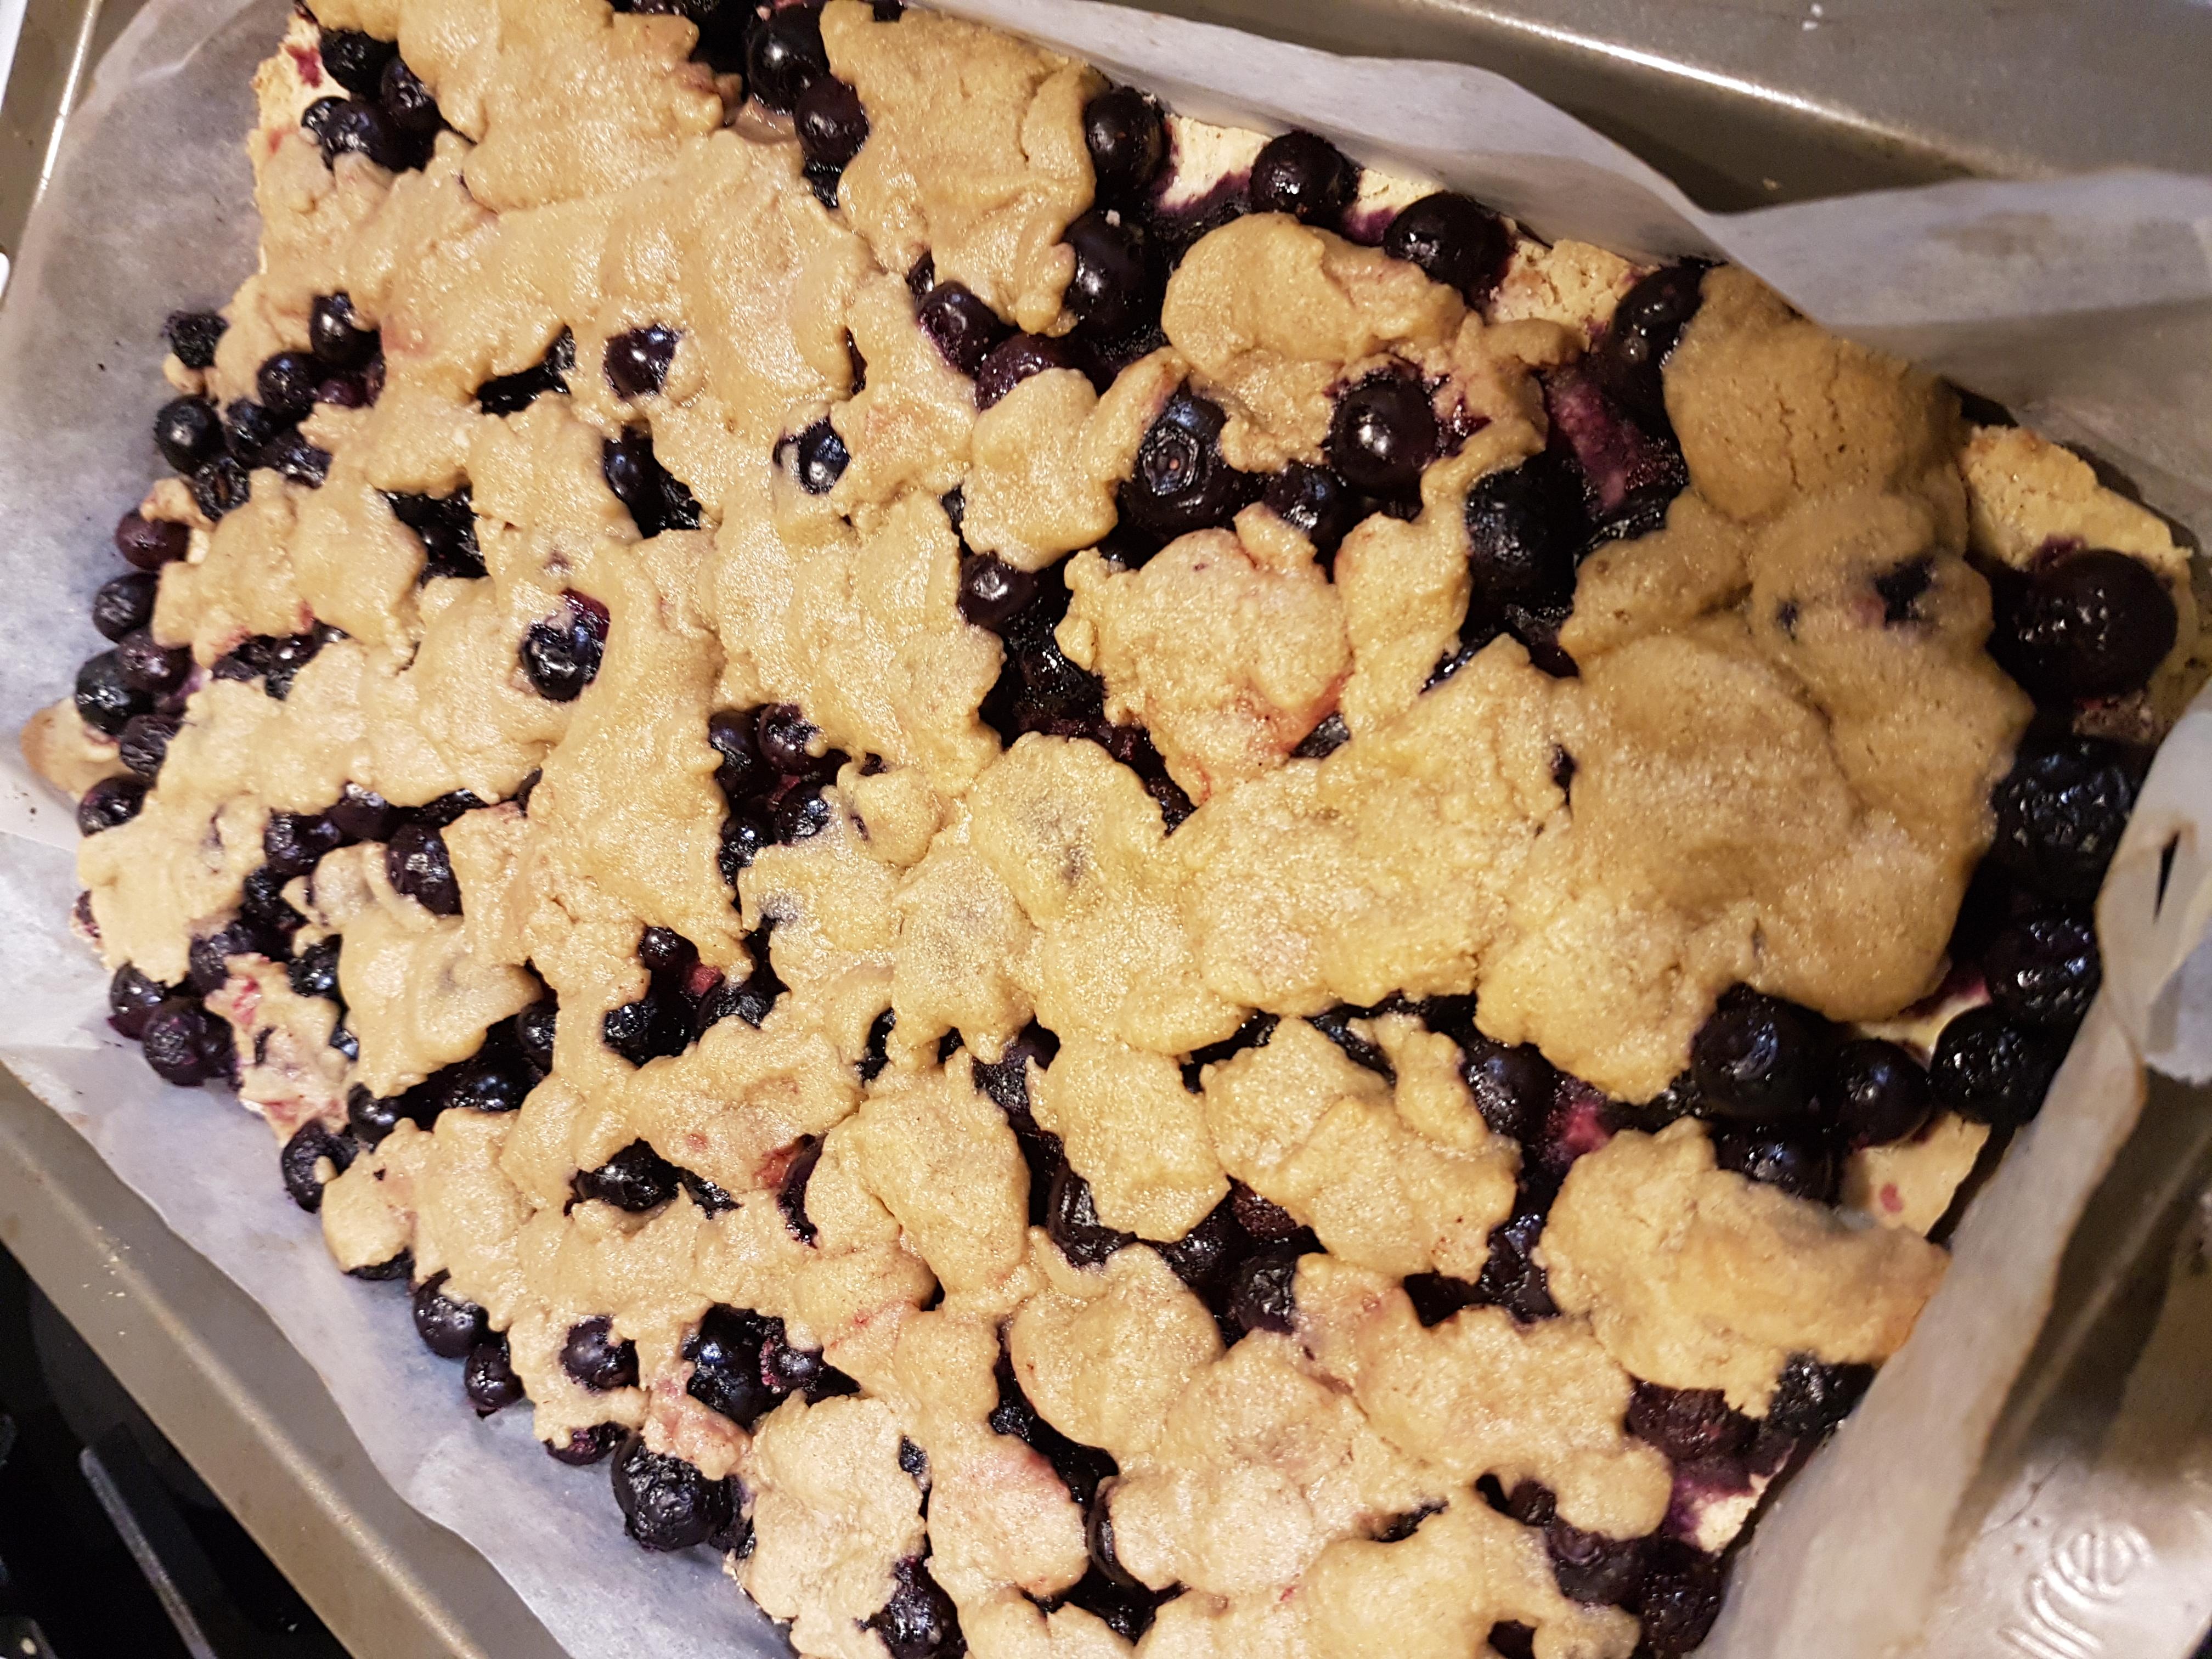 Blueberry-Lemon Crumb Bars